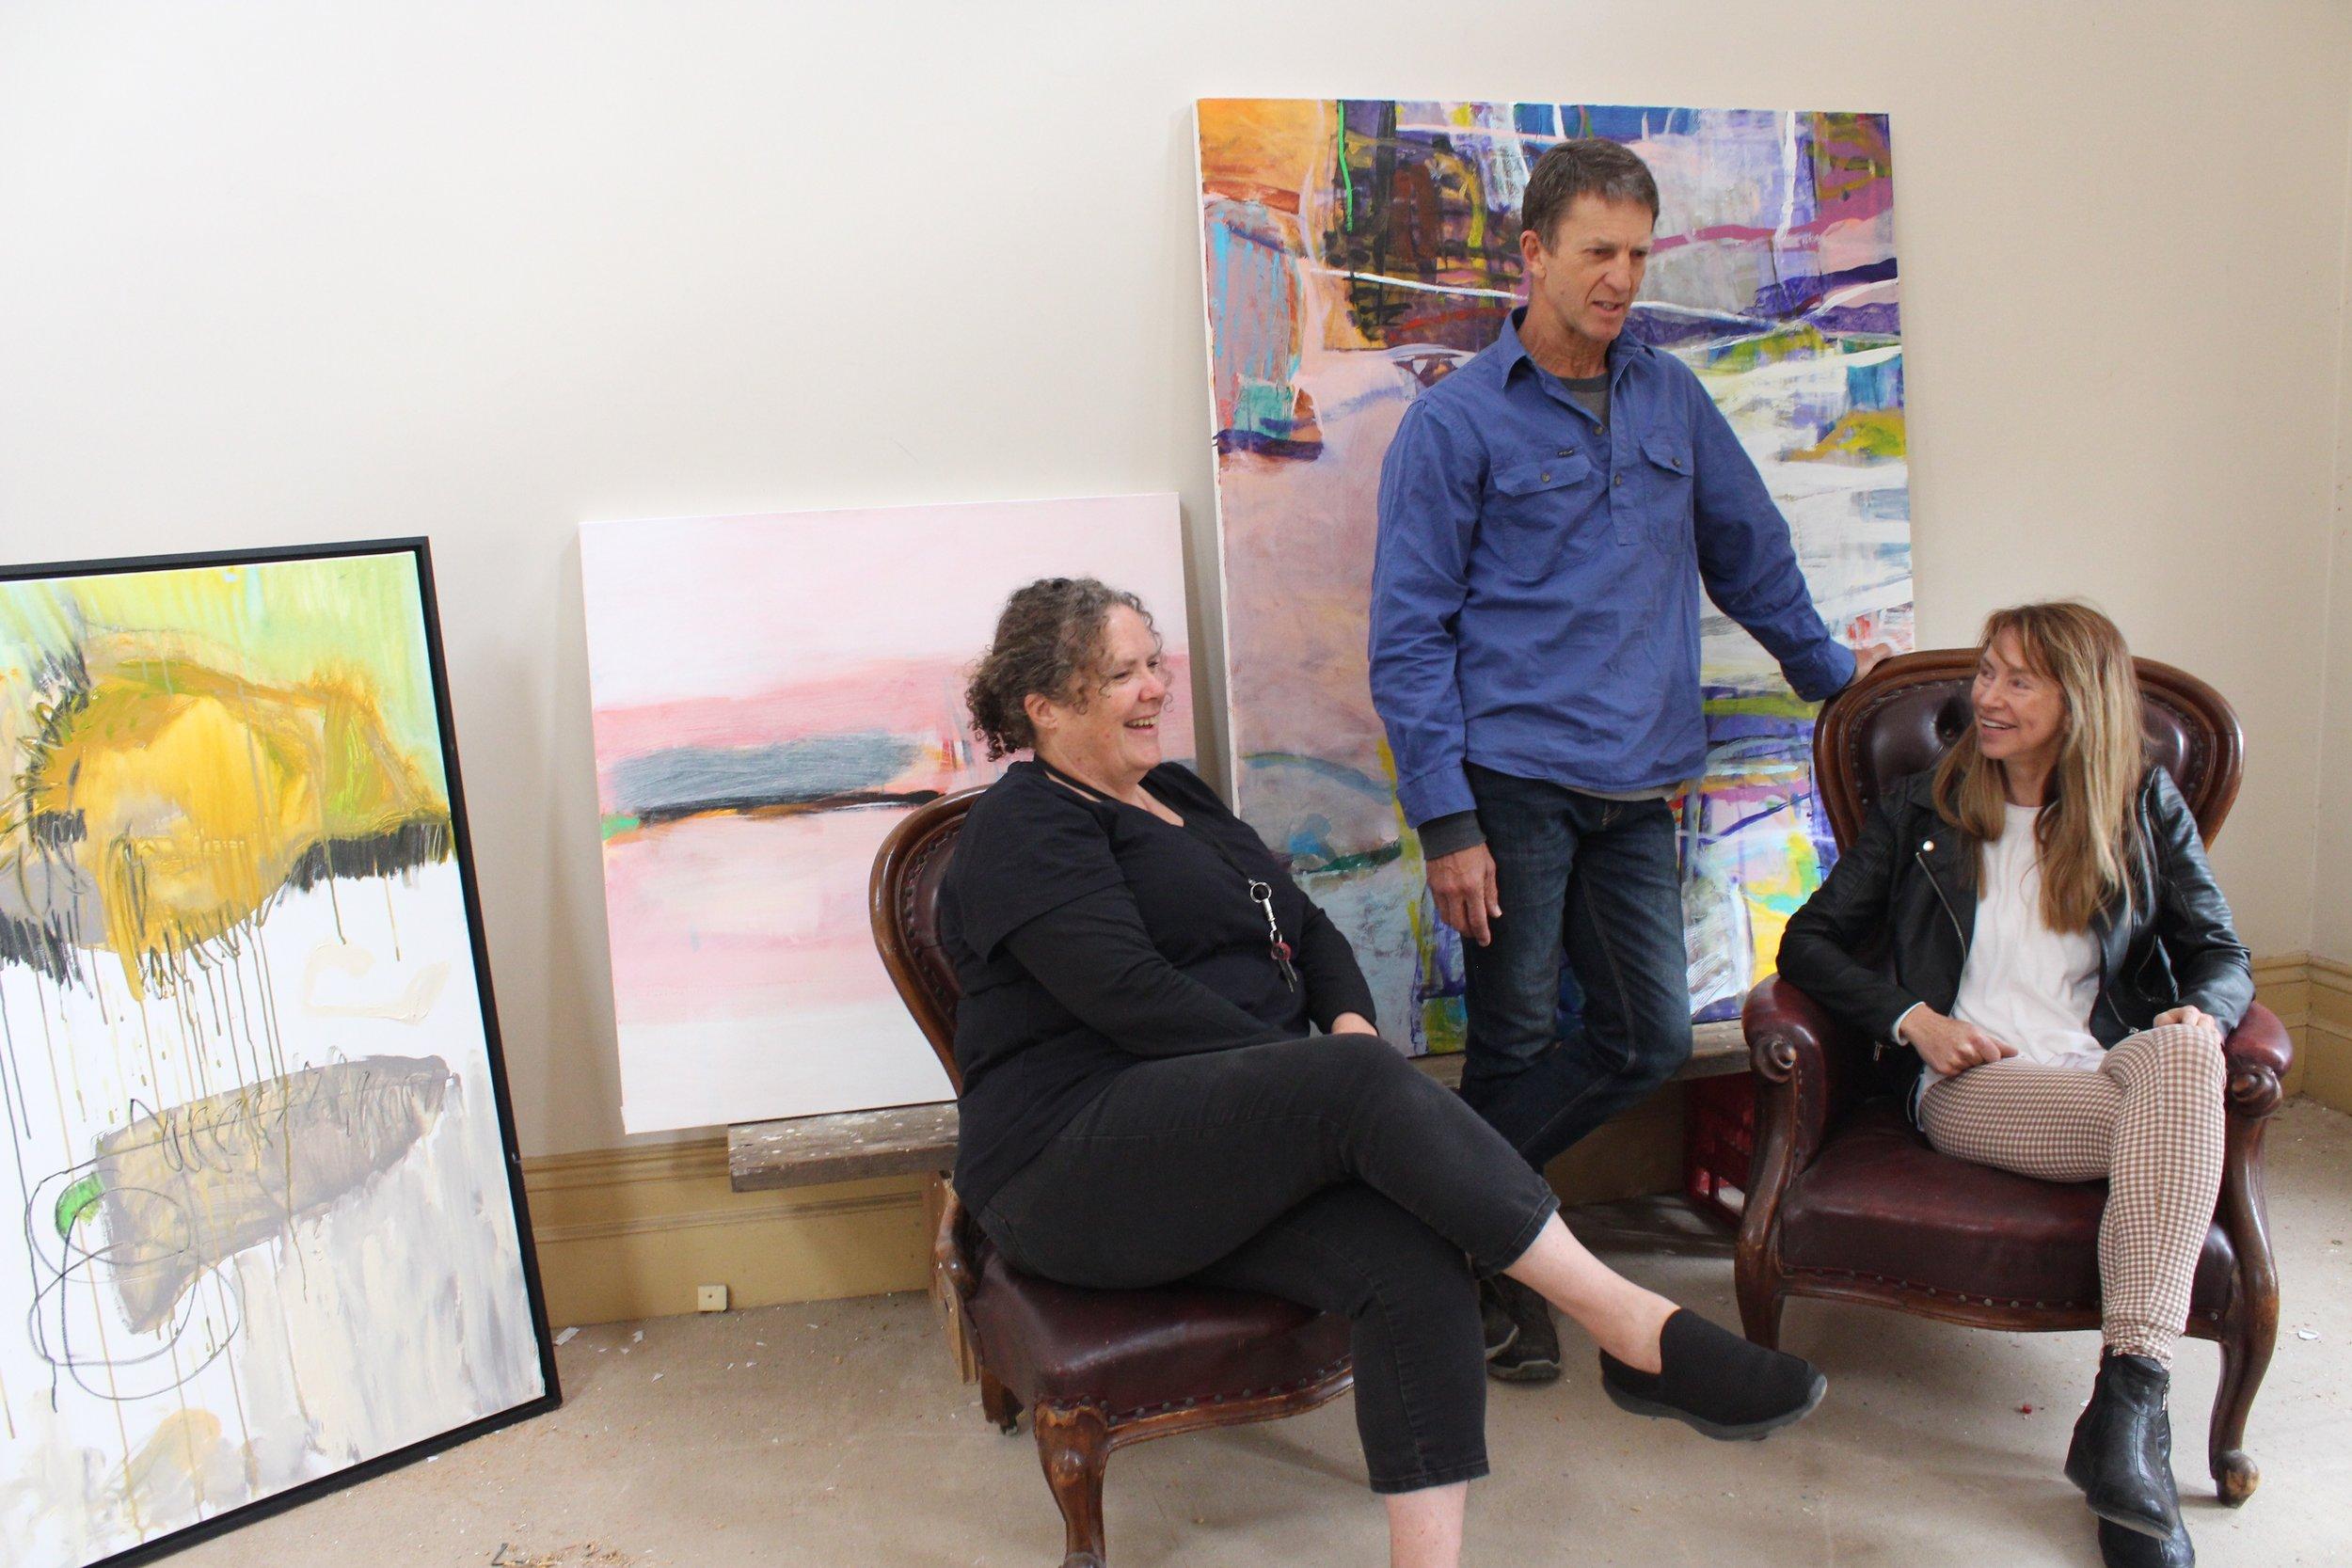 Artists Tarli Glover, Steve Sedgewick and Margie Delahunty-Spencer